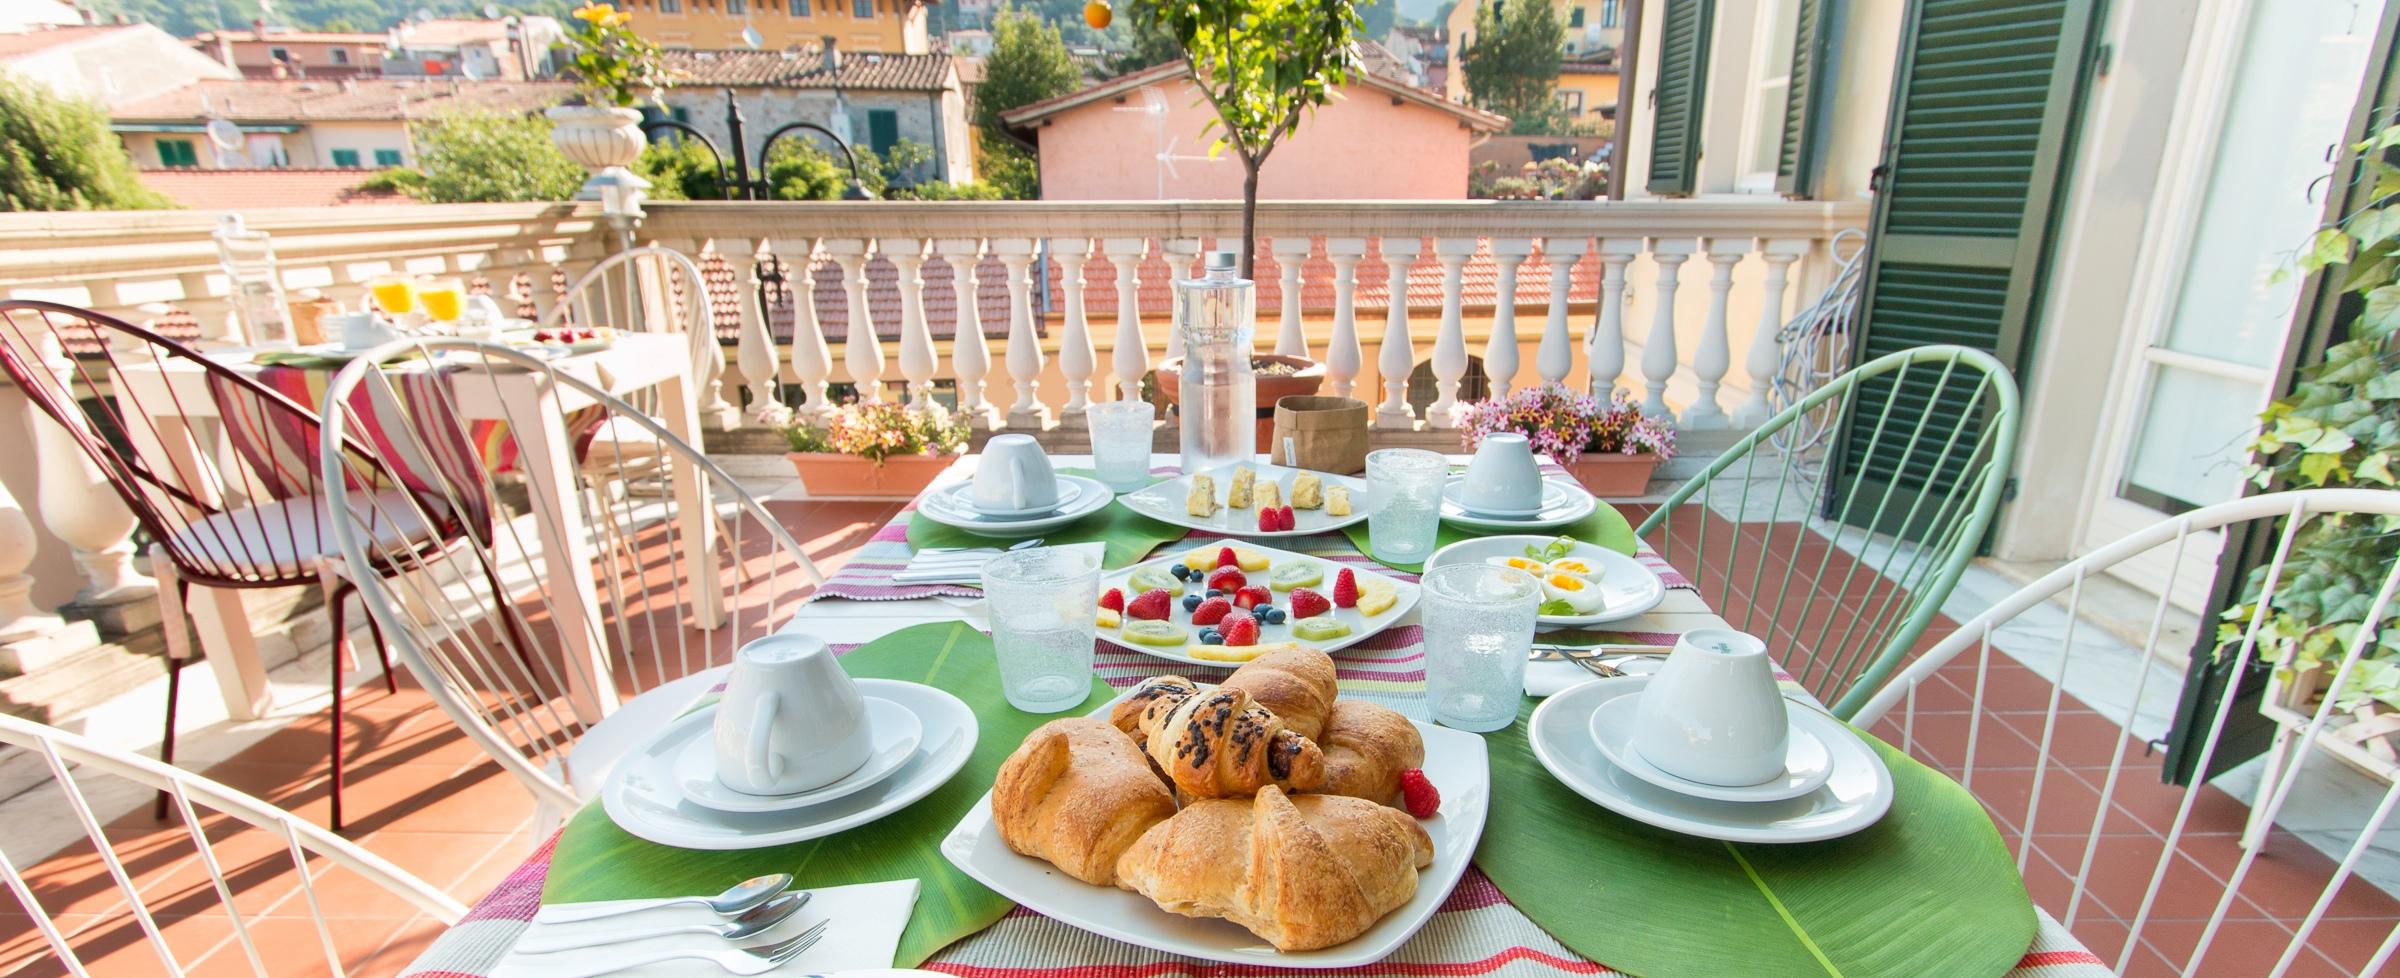 La Sosta degli Artisti Bed & Breakfast (2)